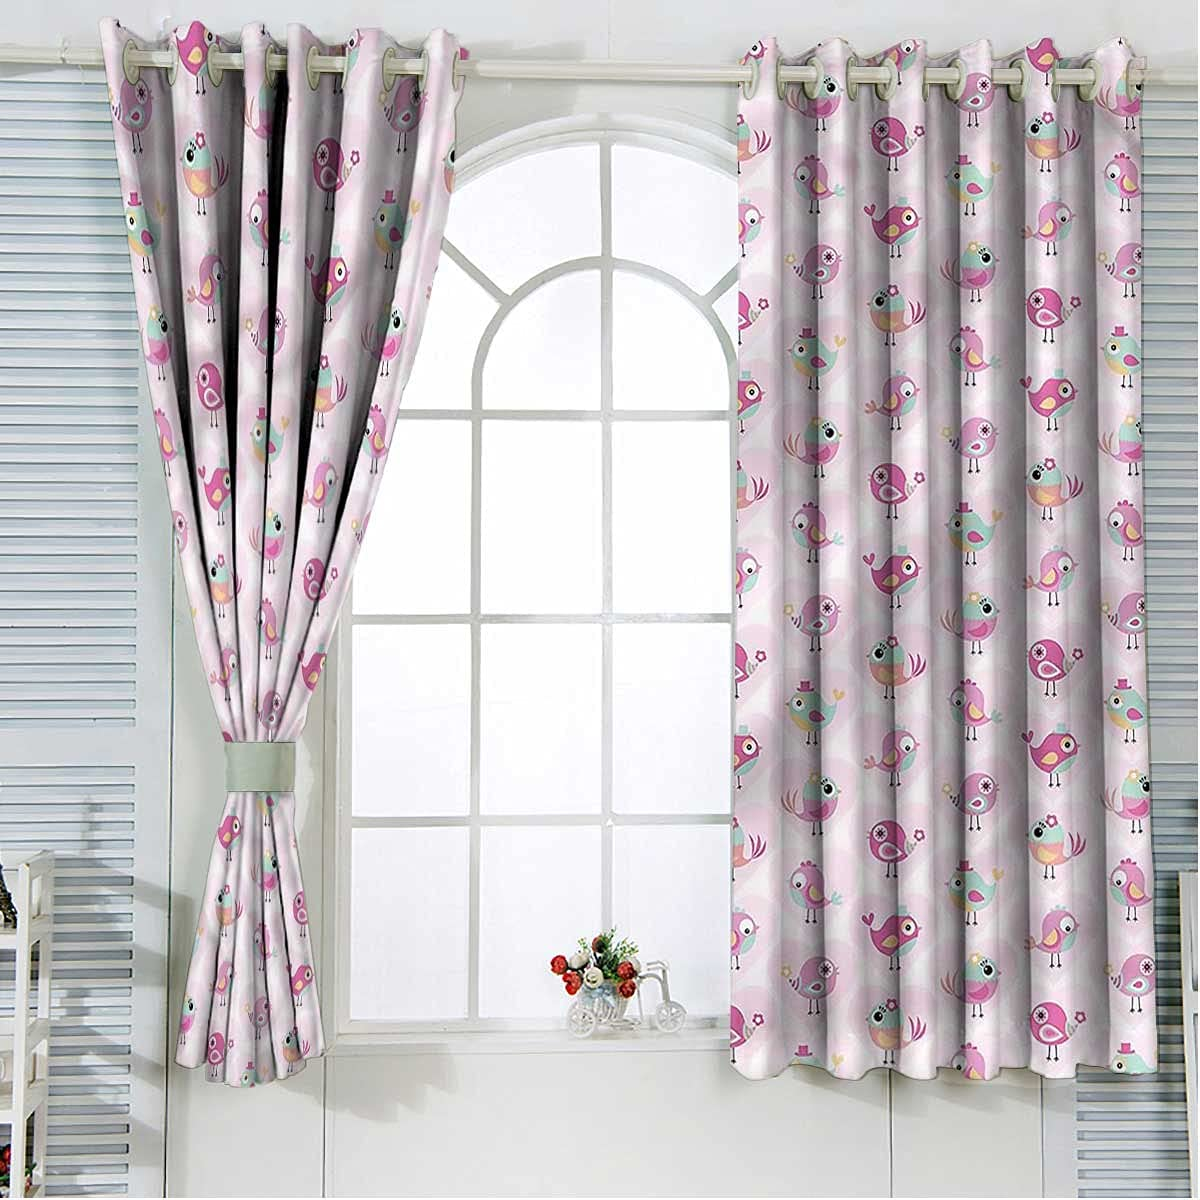 Love Door Window Curtains 108 Inch Birds Cute Length Ranking TOP5 Pink Regular dealer Hearts